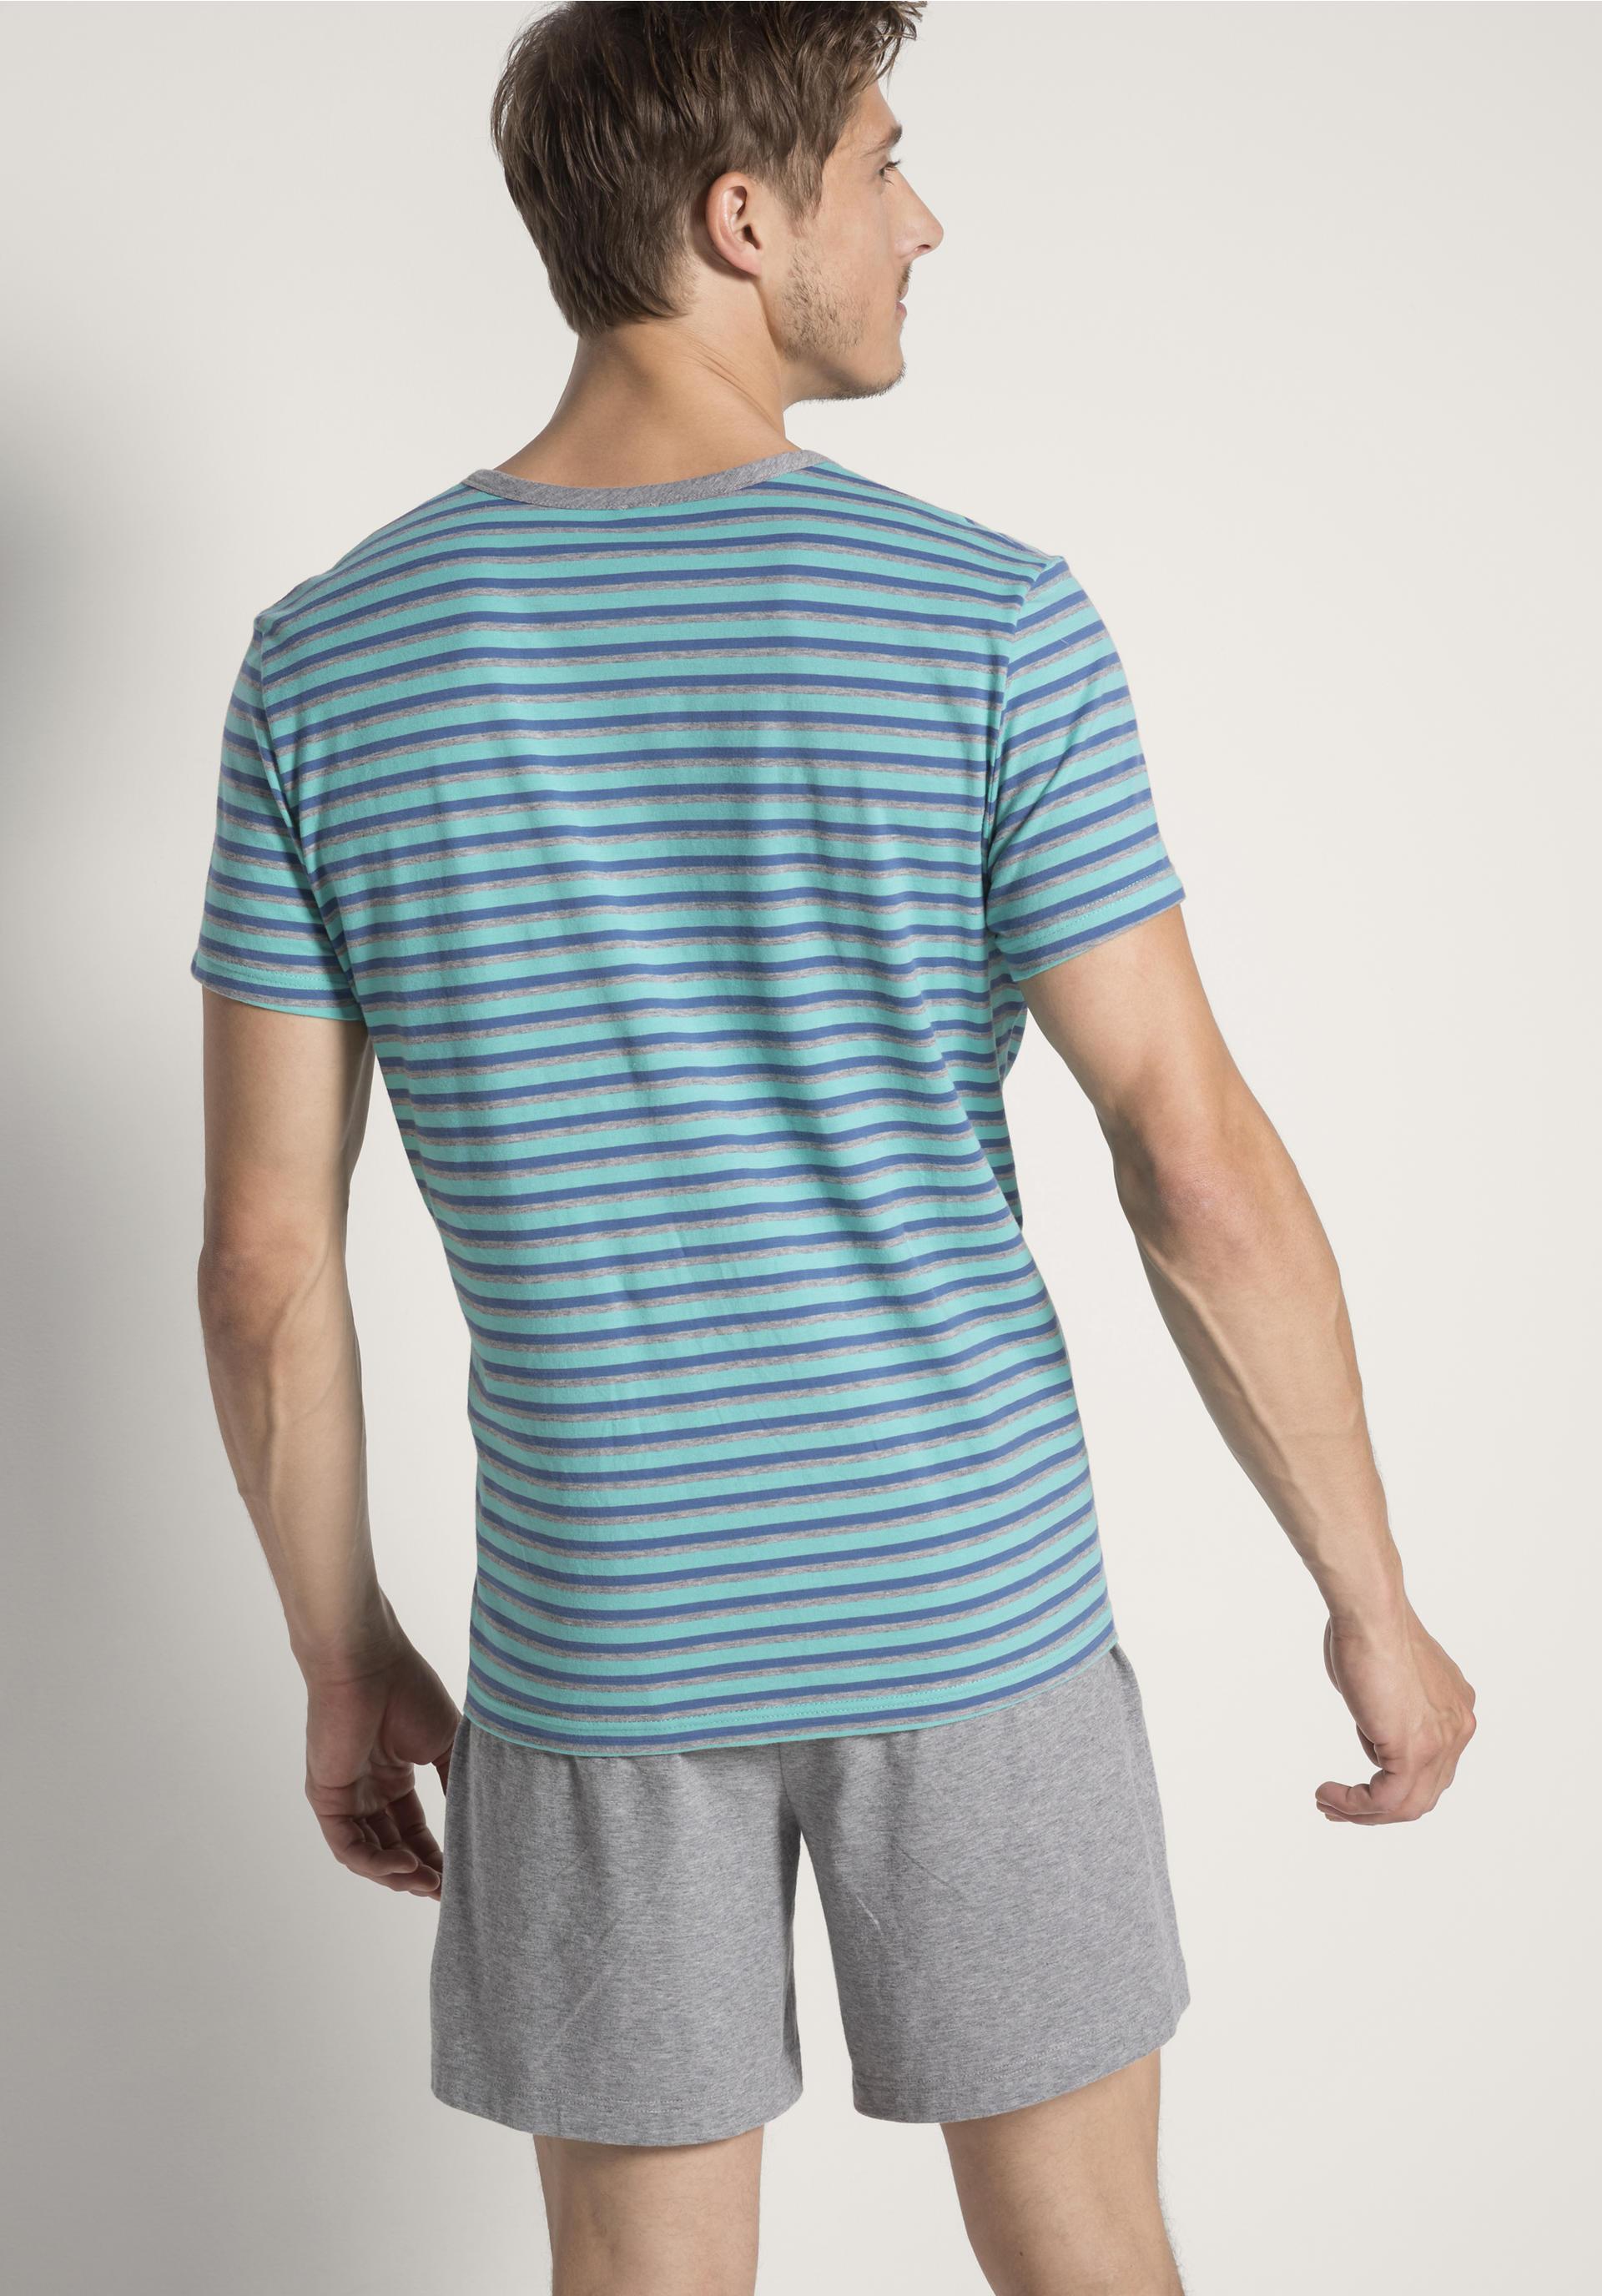 wholesale dealer 24366 b892e Sale - günstige Bio Herren Pyjamas online kaufen - hessnatur ...